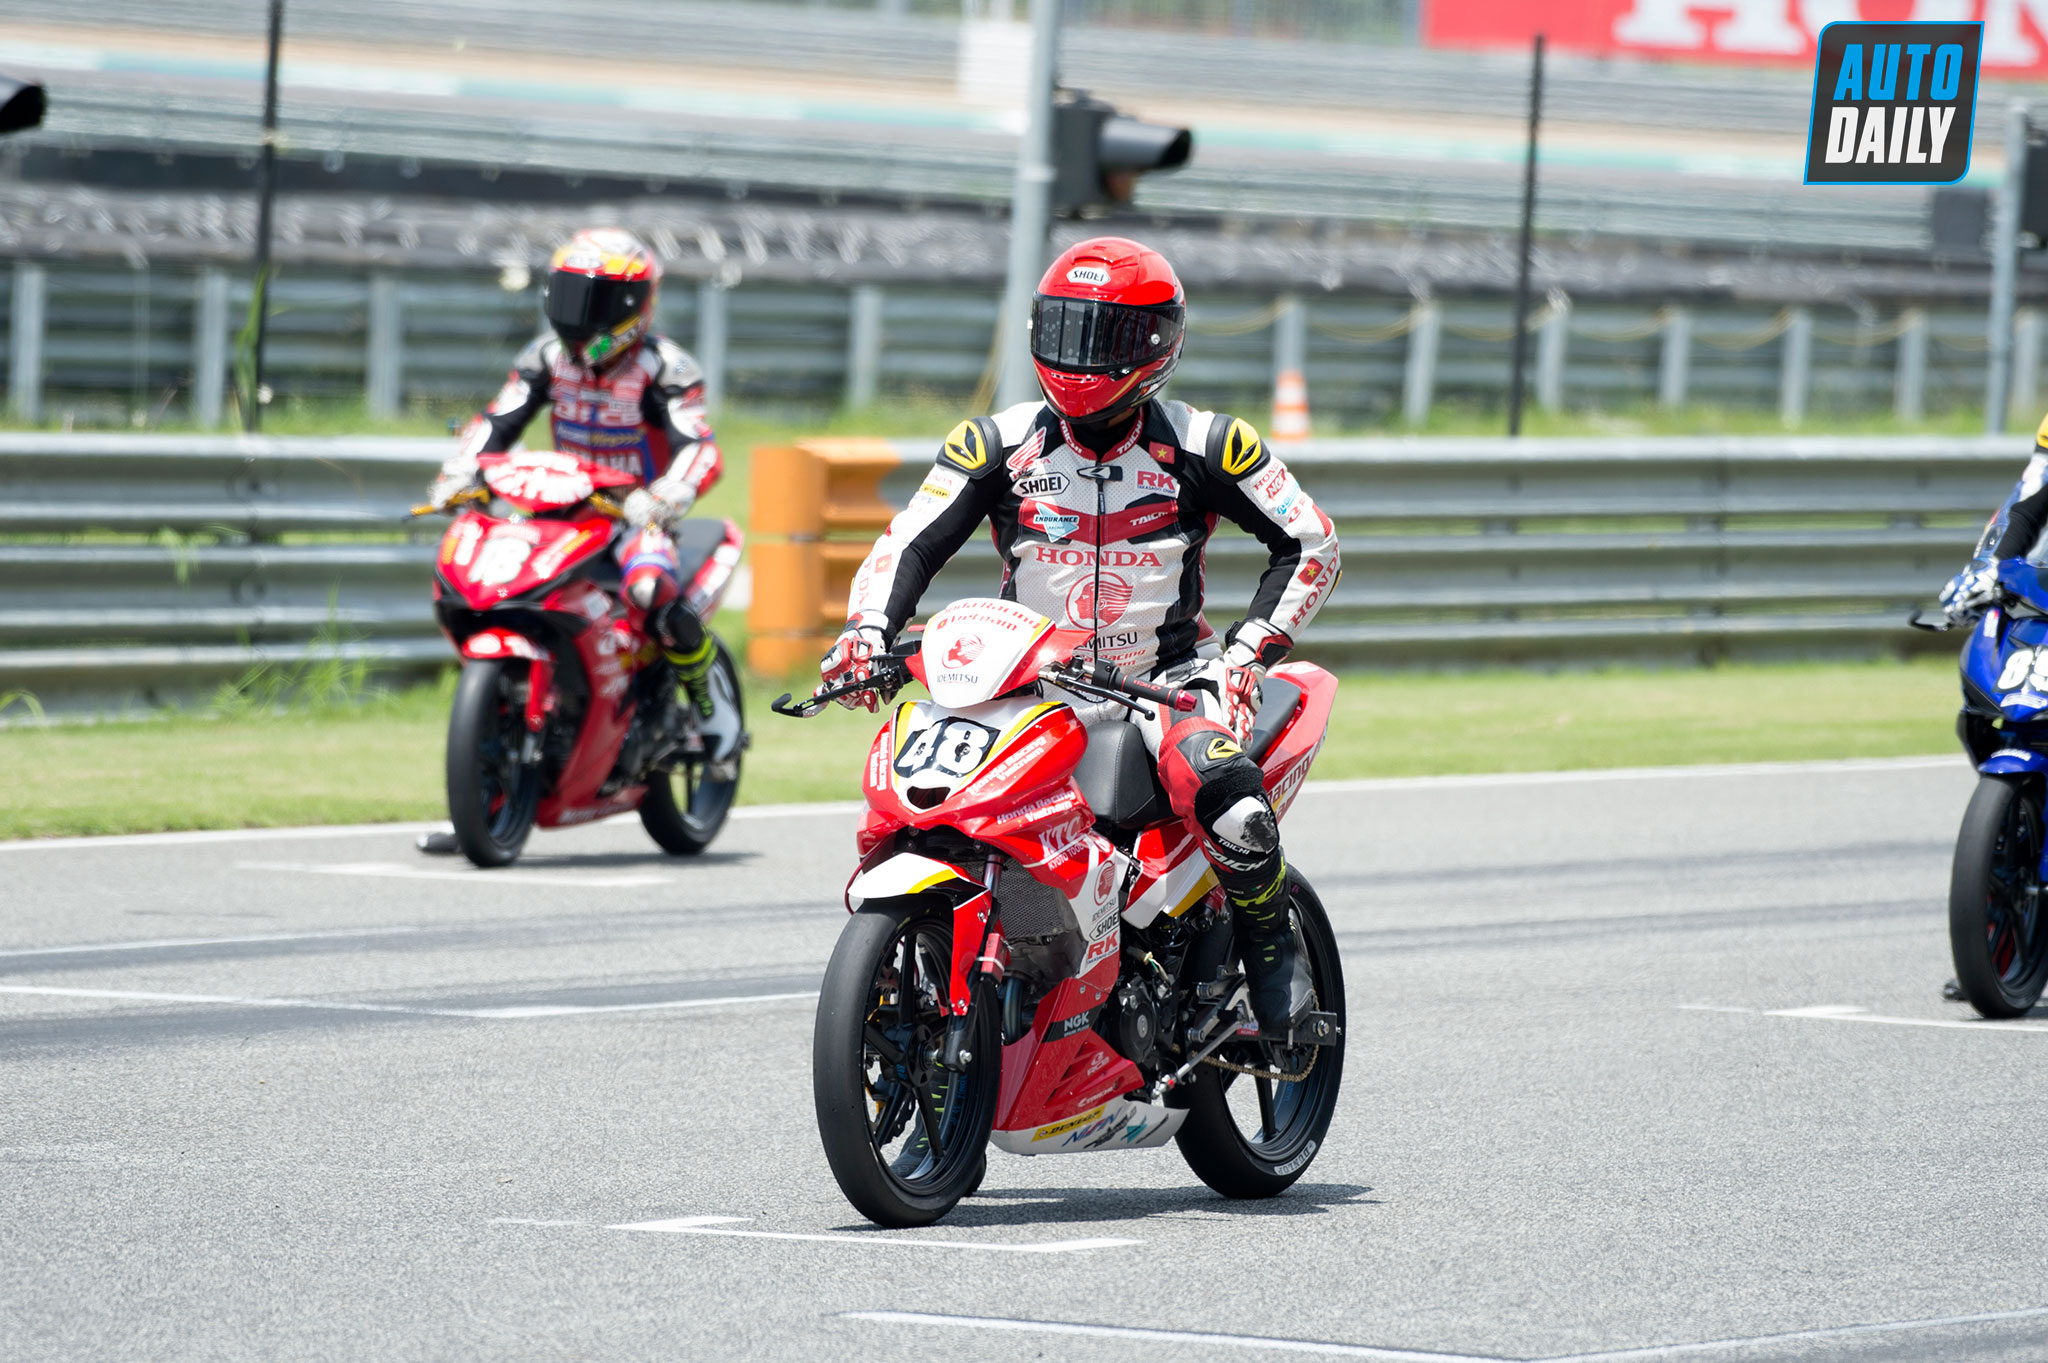 arrc-2019-round3-race1-010.jpg